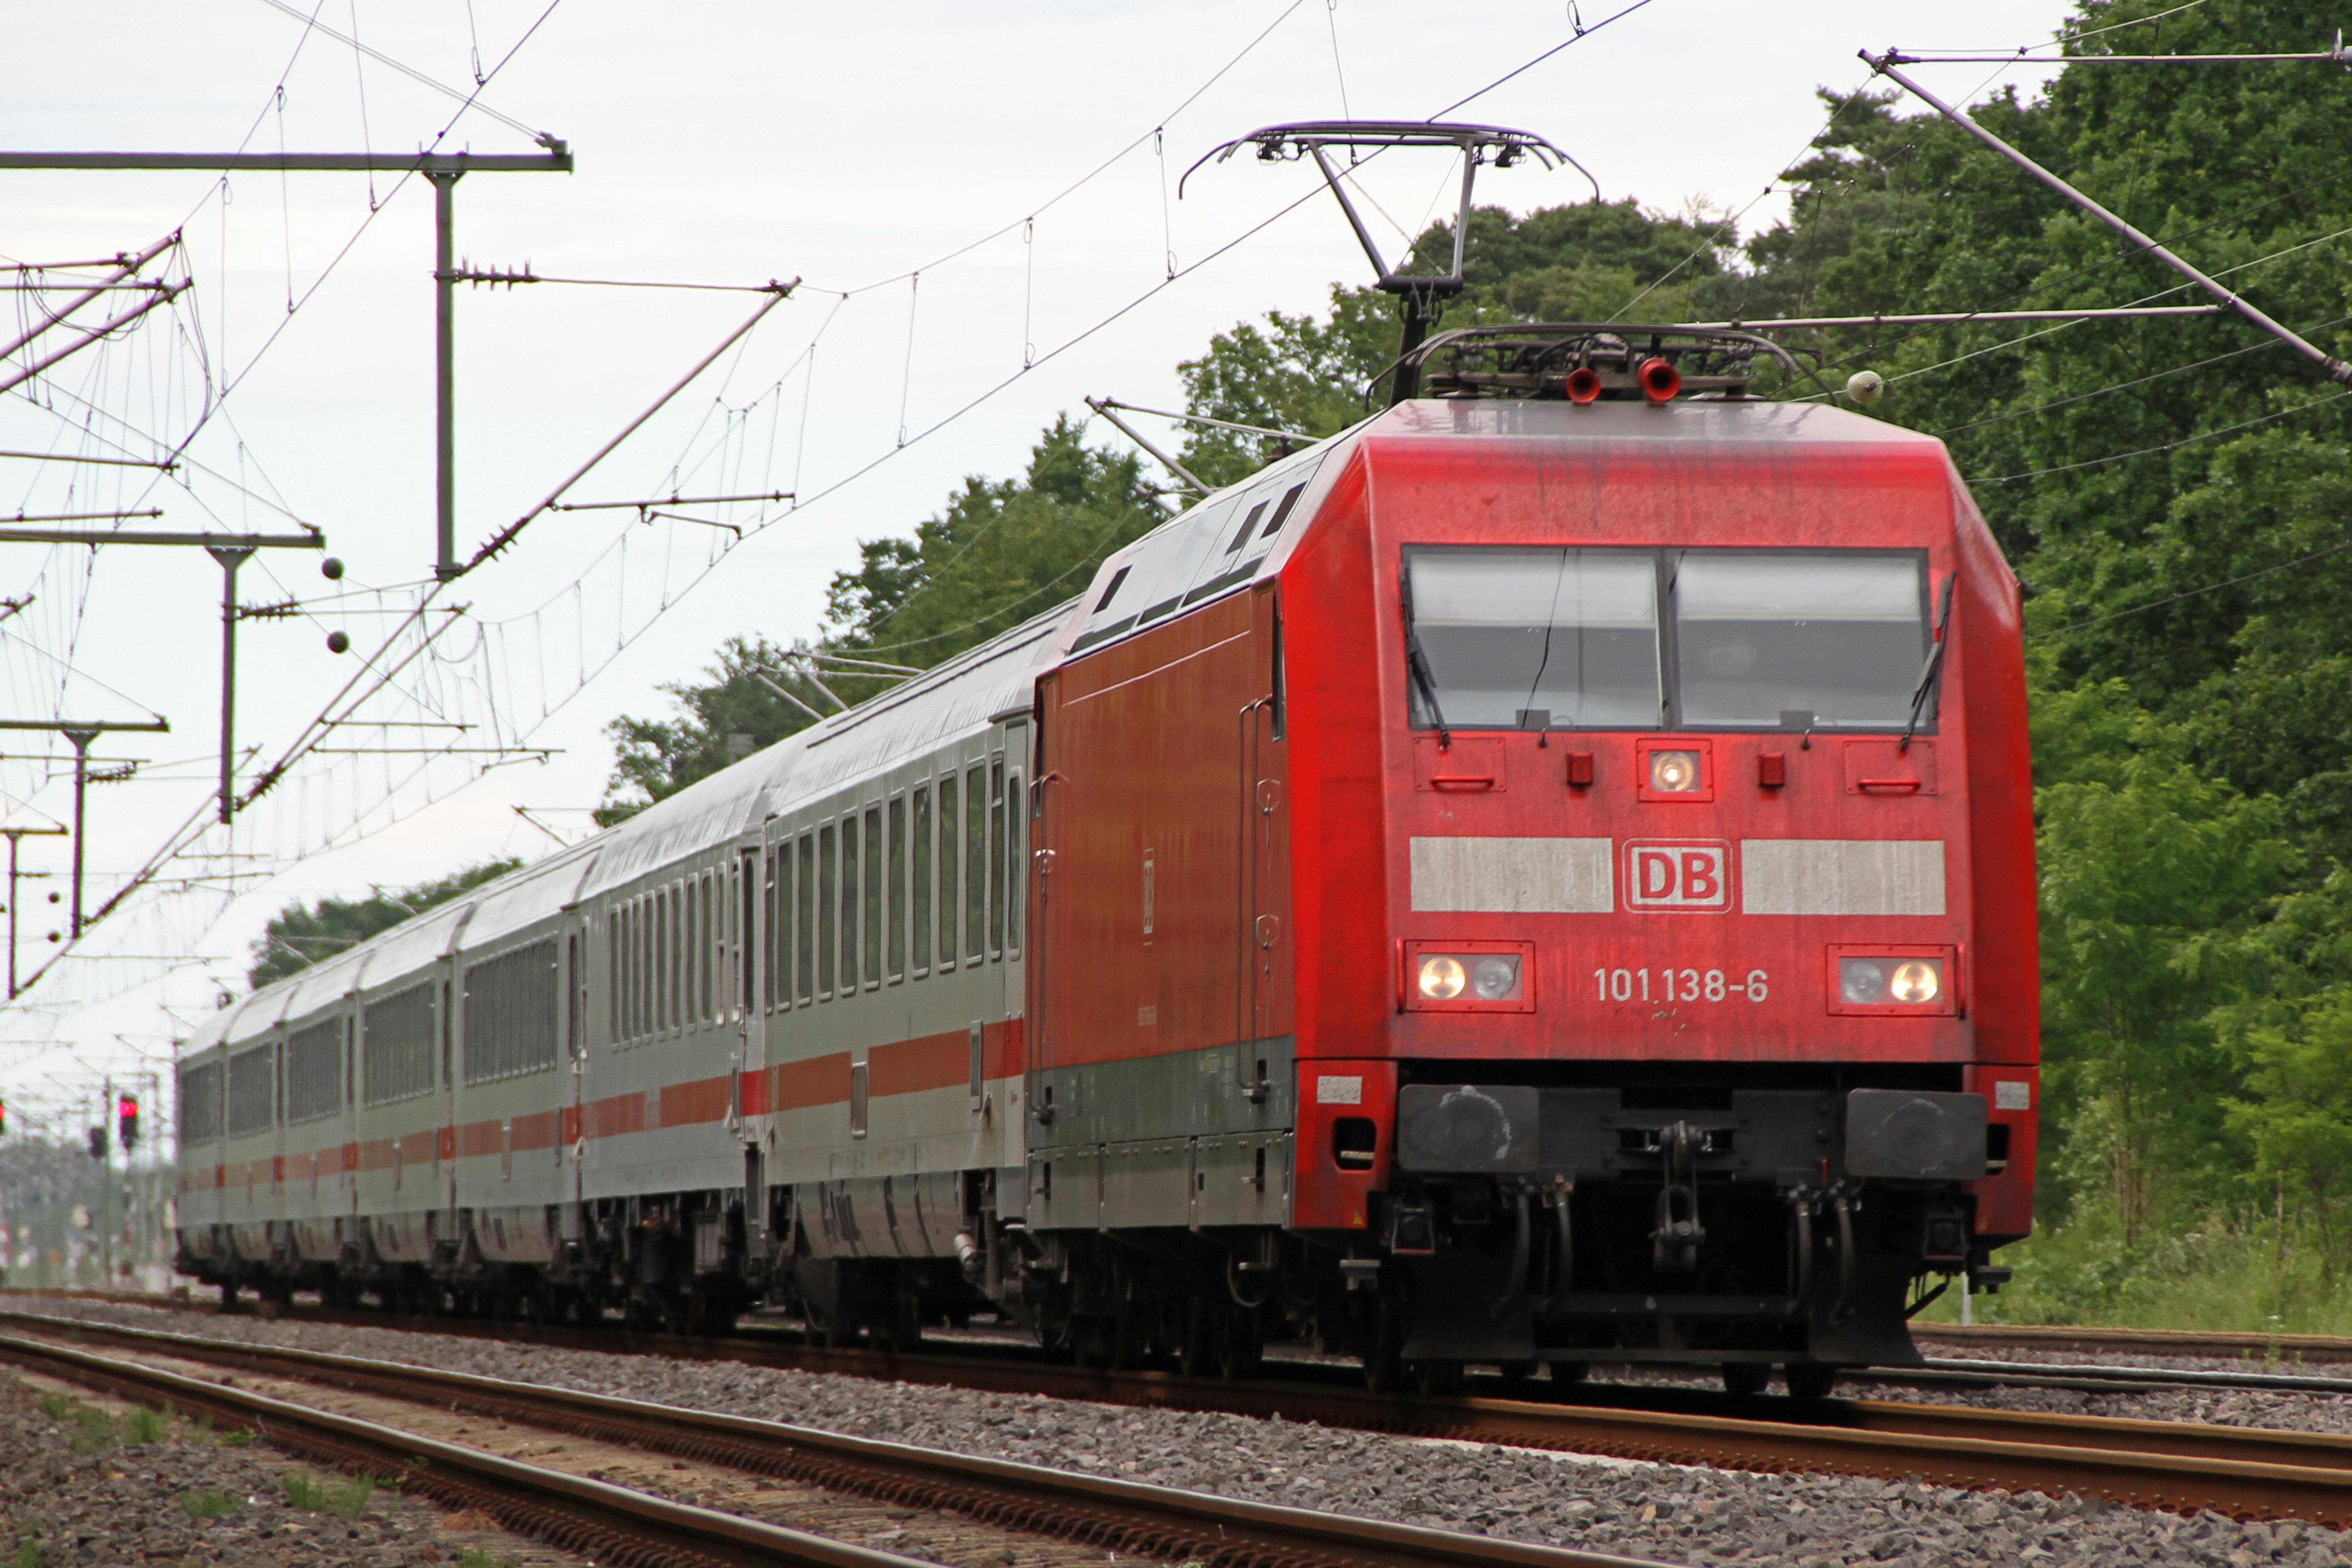 DBAG-Baureihe 101, Elektrolokomotive der Baureihe 101.1, Bombardier TRAXX. Foto: Peter Stehlik (= PS-2507 ). Lizenz: CC BY-SA 3.0